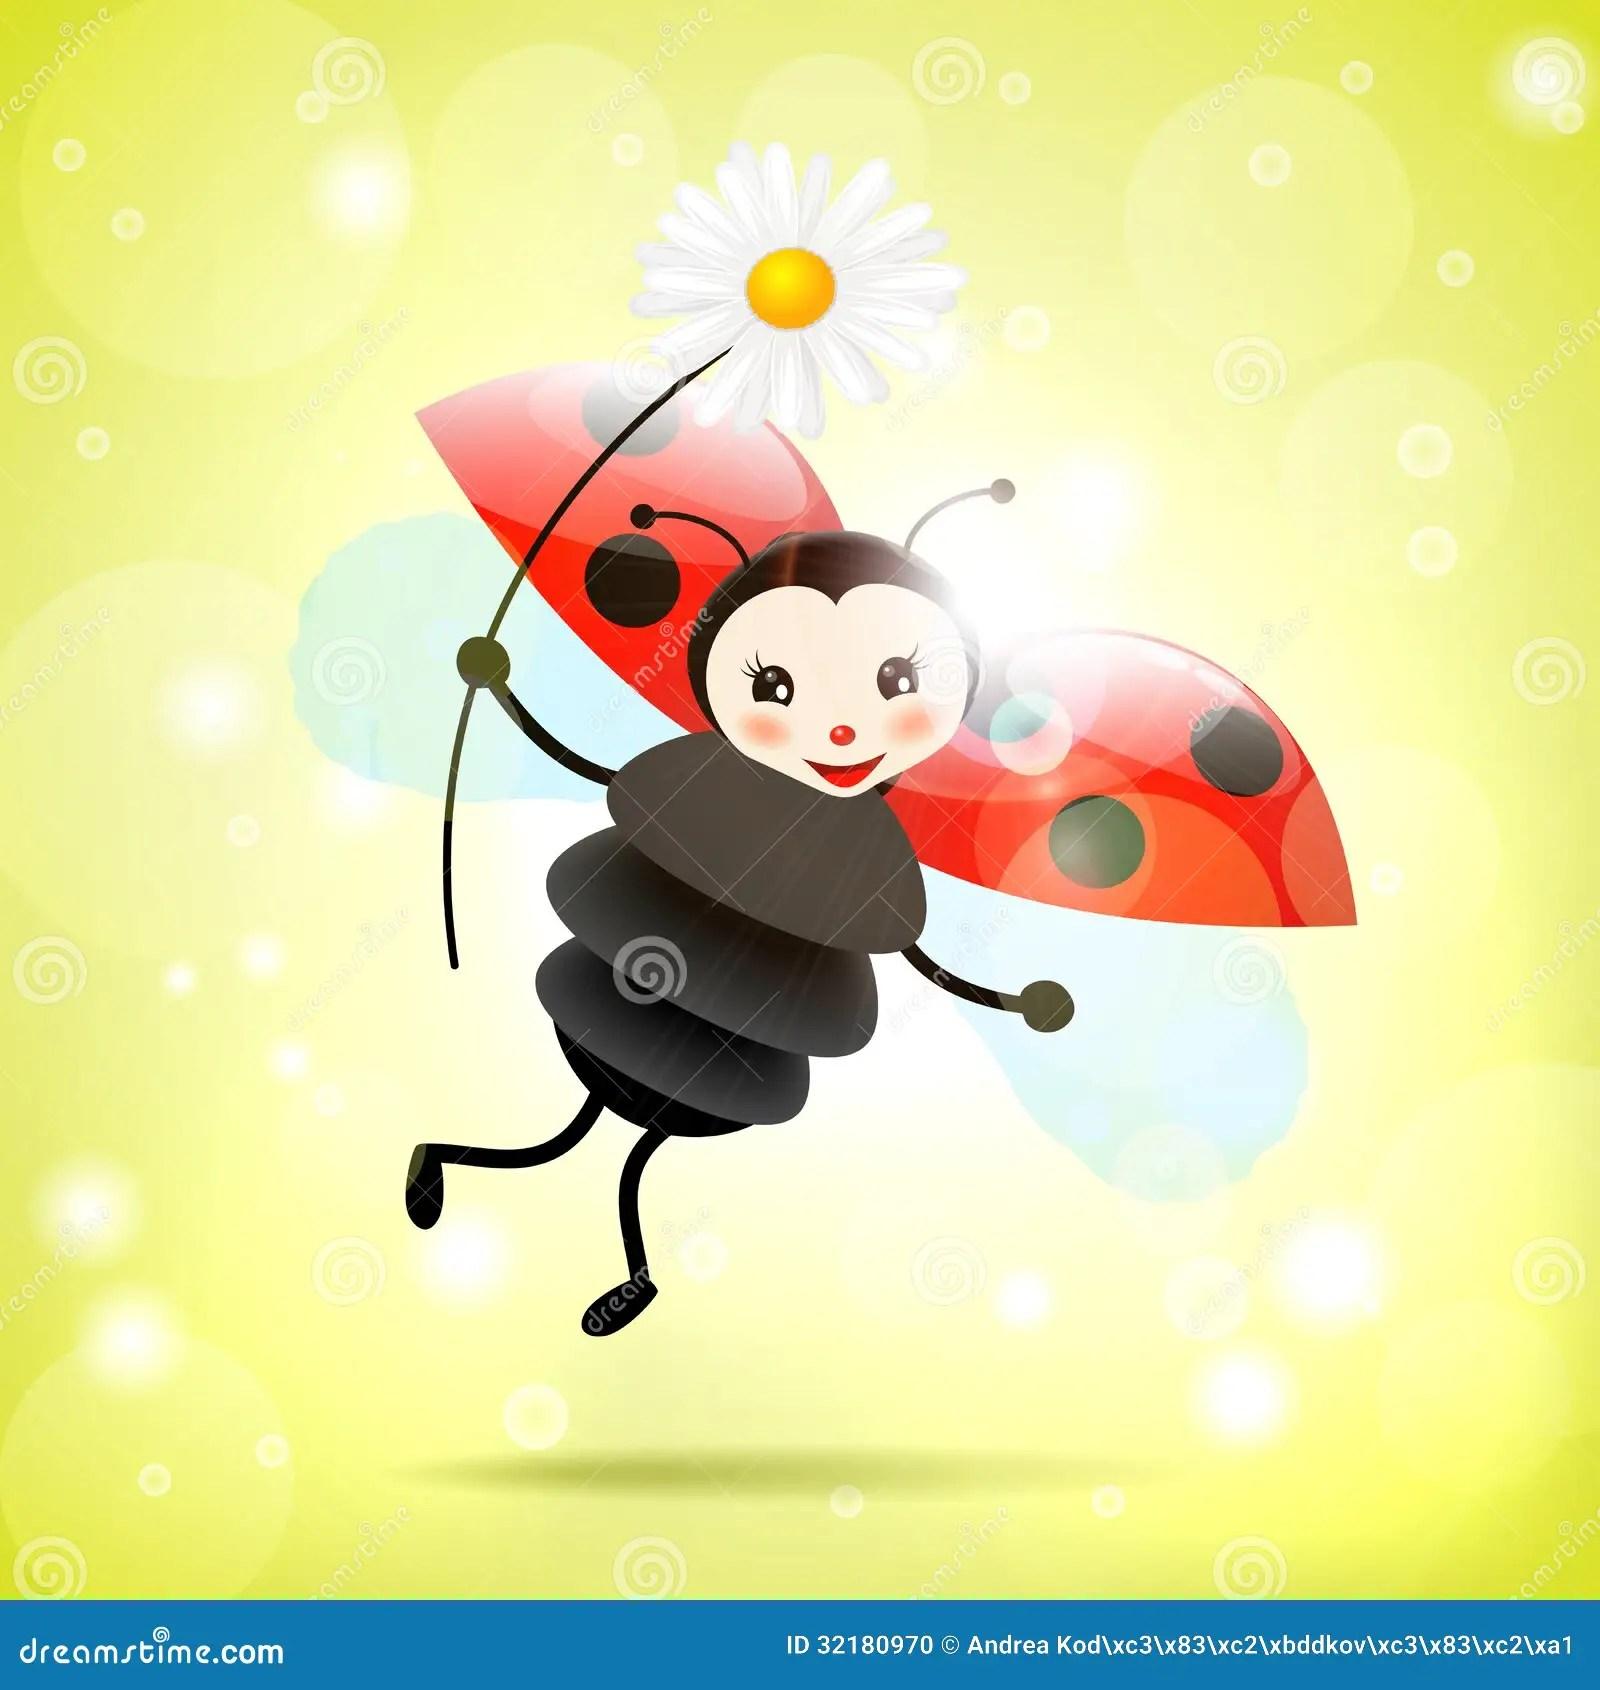 Happy Ladybug With Daisy Illustration Stock Vector